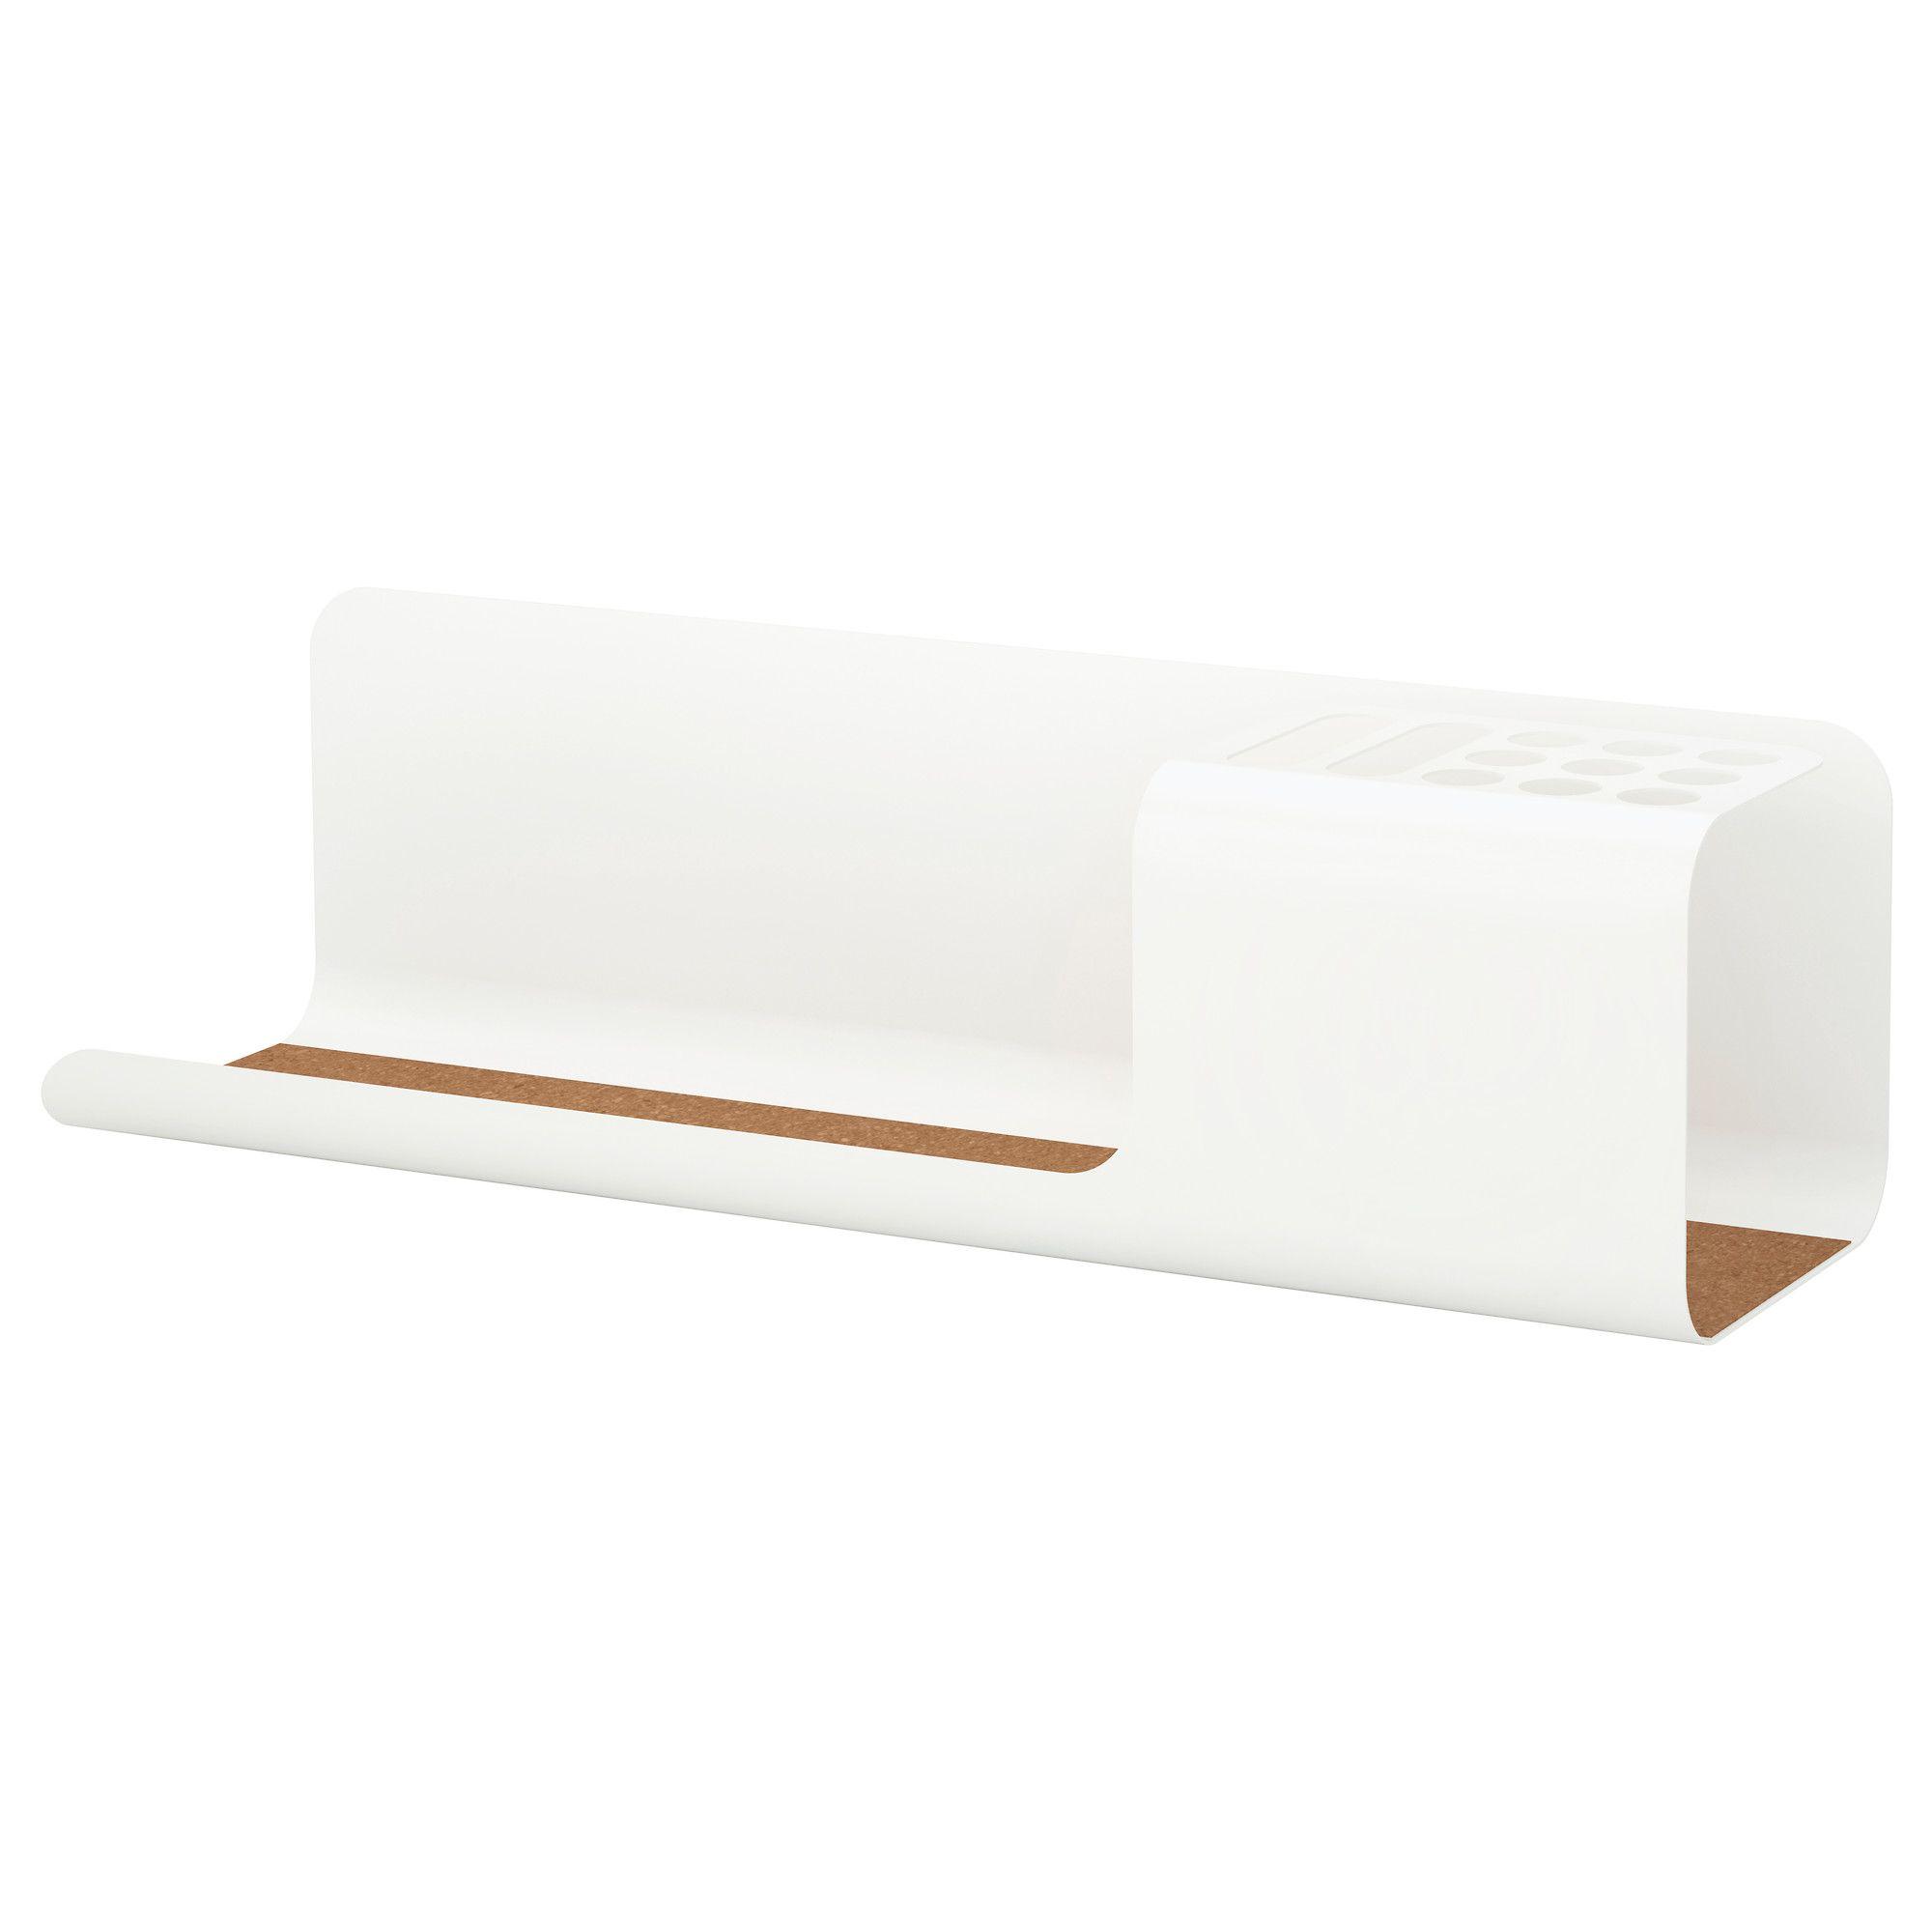 Ikea Us Furniture And Home Furnishings Desk Organization Desk Organization Ikea Ikea